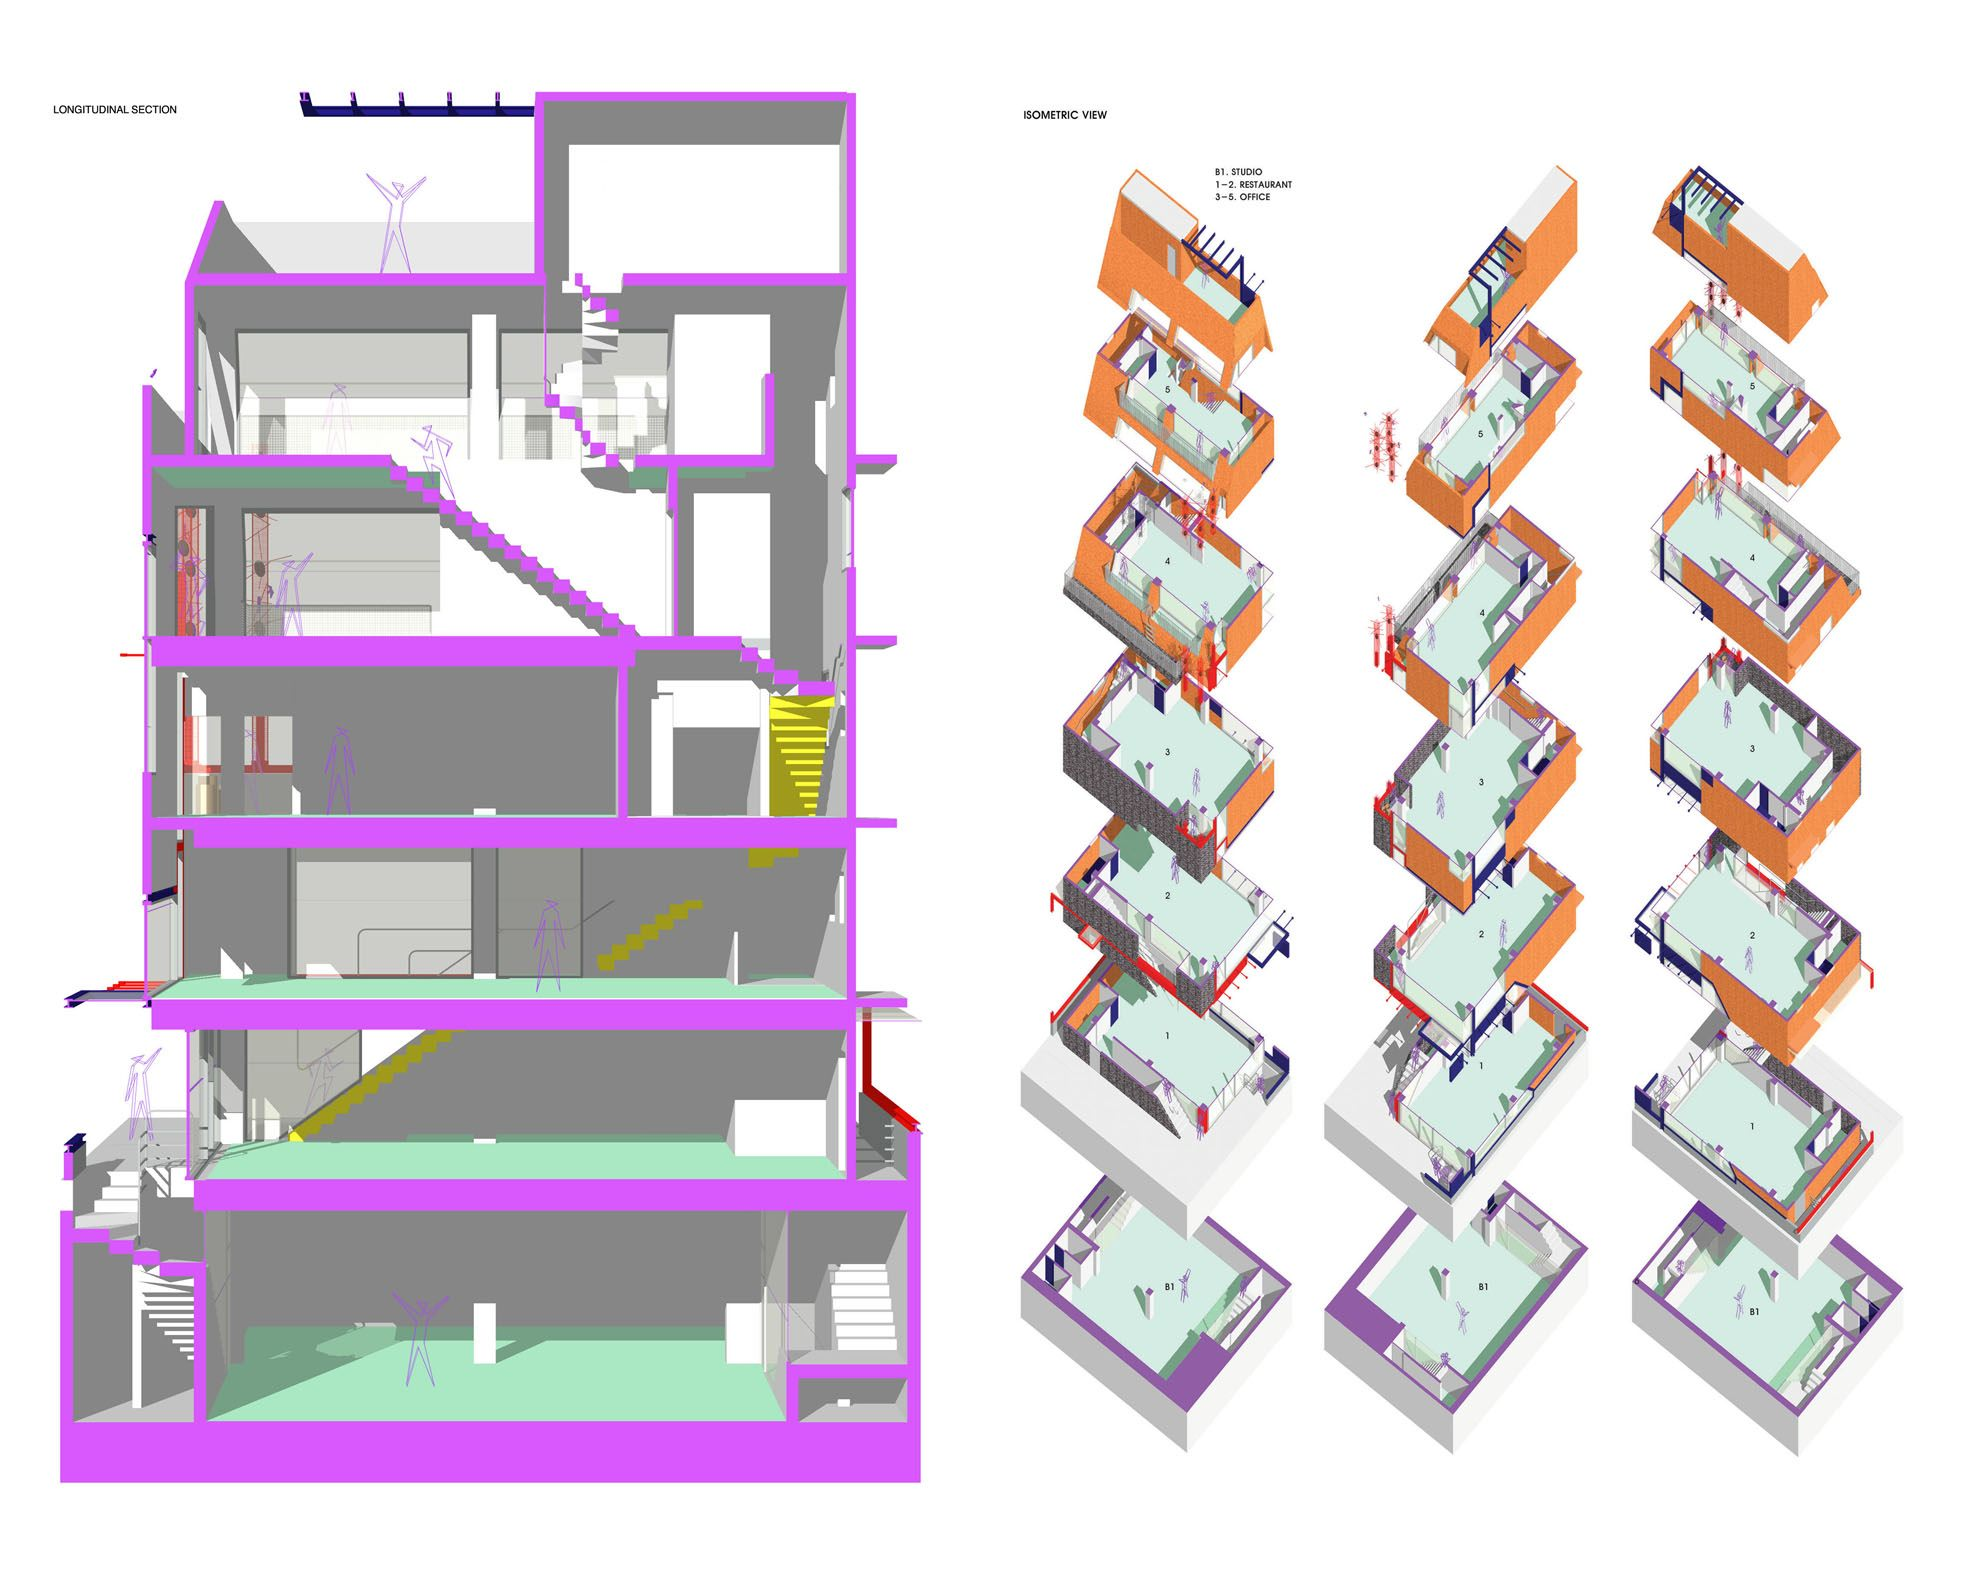 07 jamwon 40.6 long section + axo.jpg